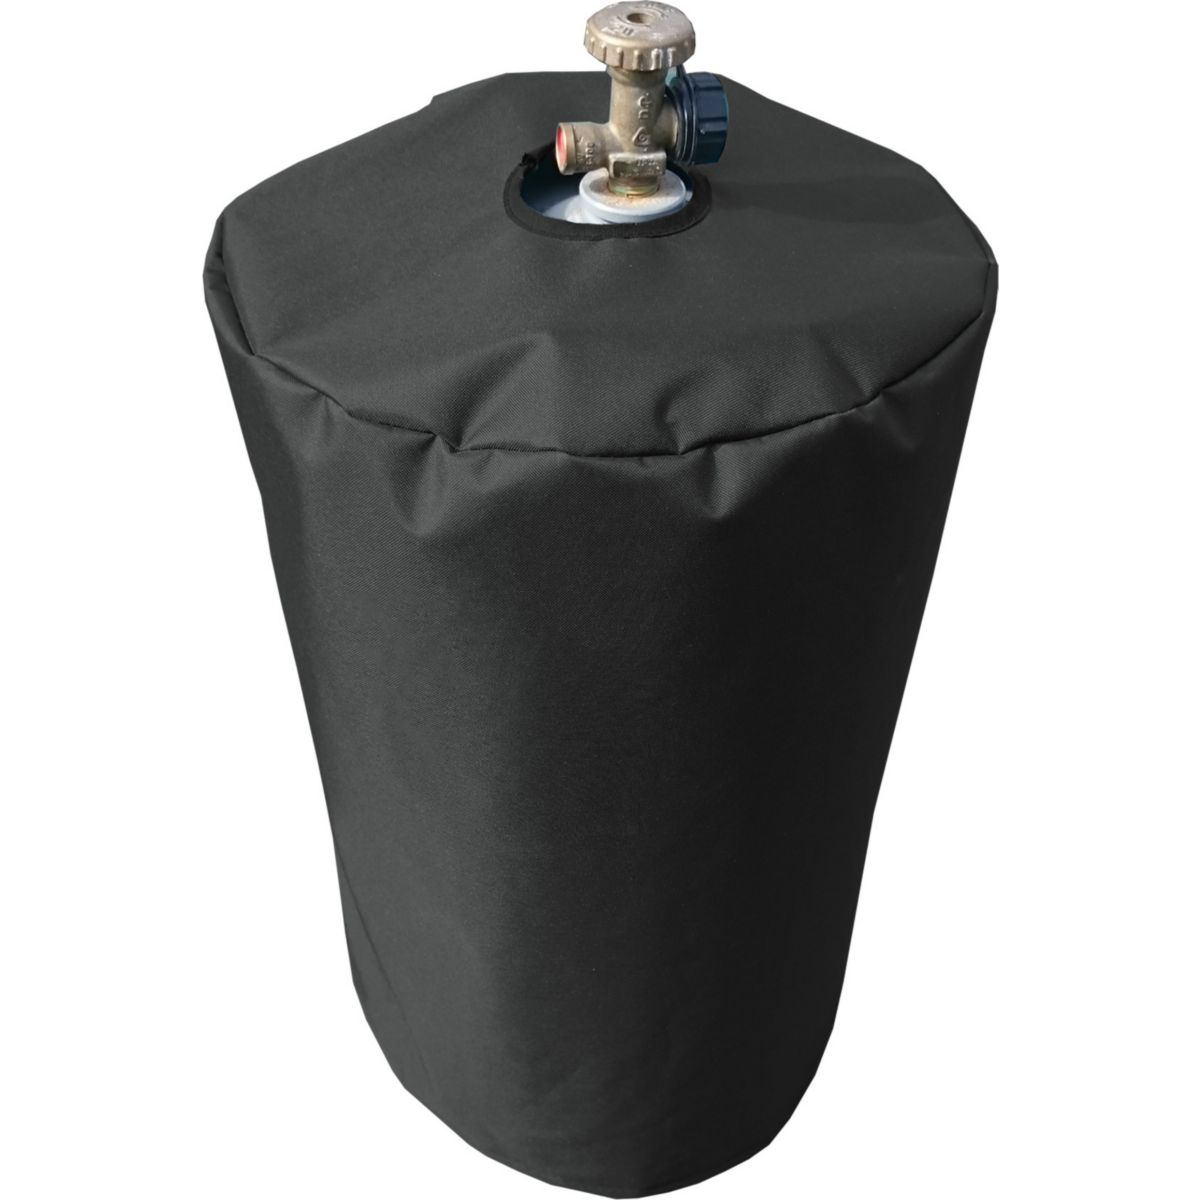 Schutzhülle Gasflasche 11kg jetztbilligerkaufen